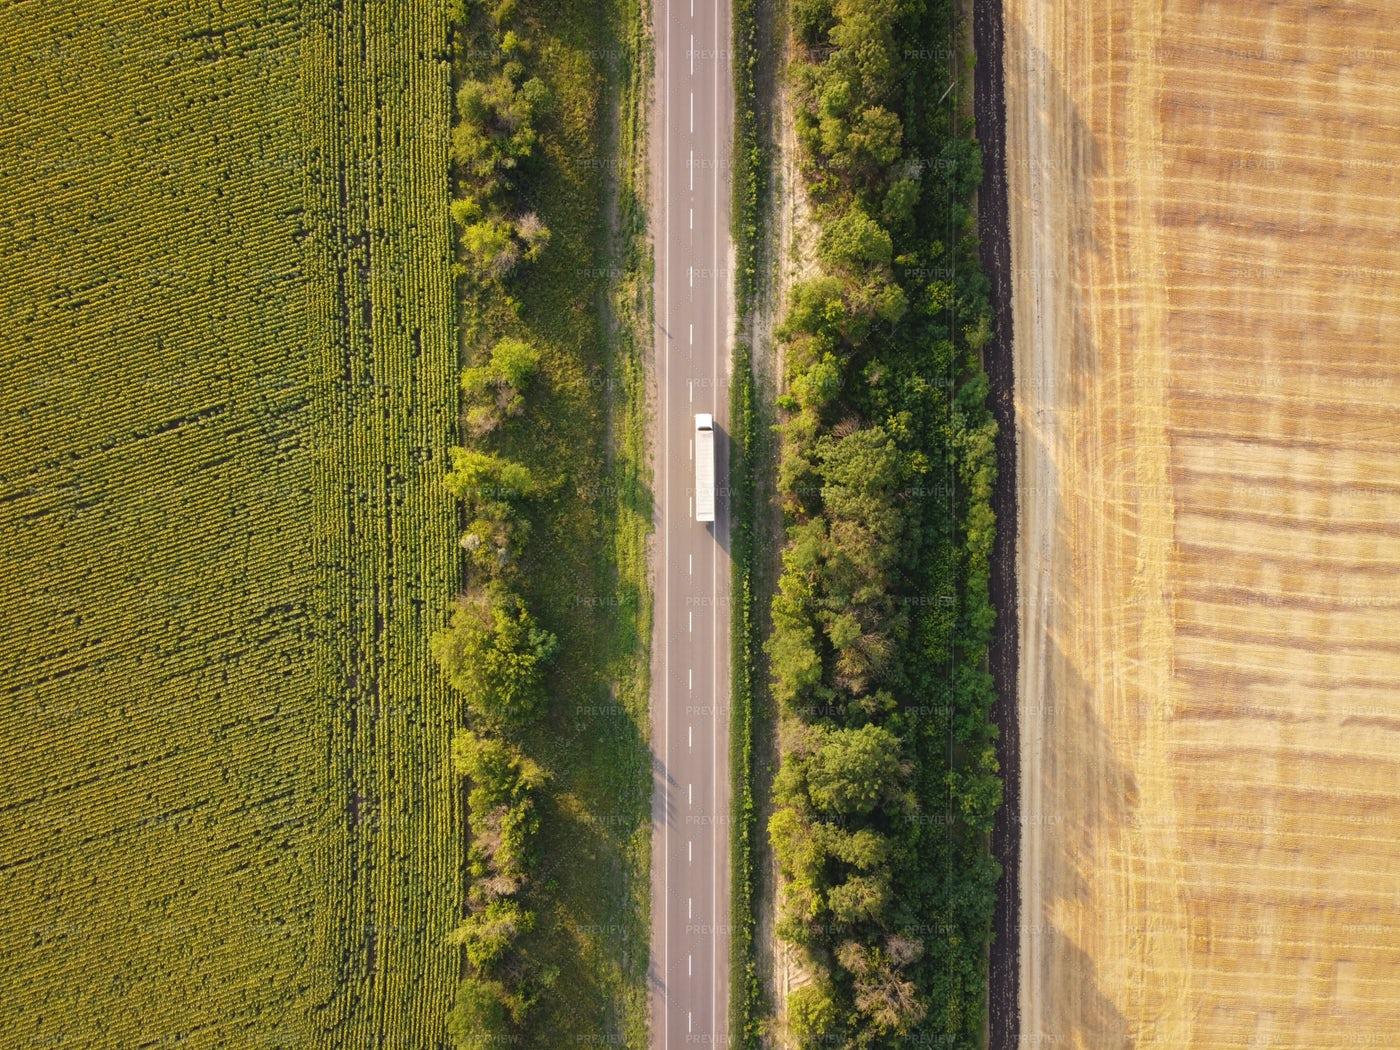 Rural Road: Stock Photos